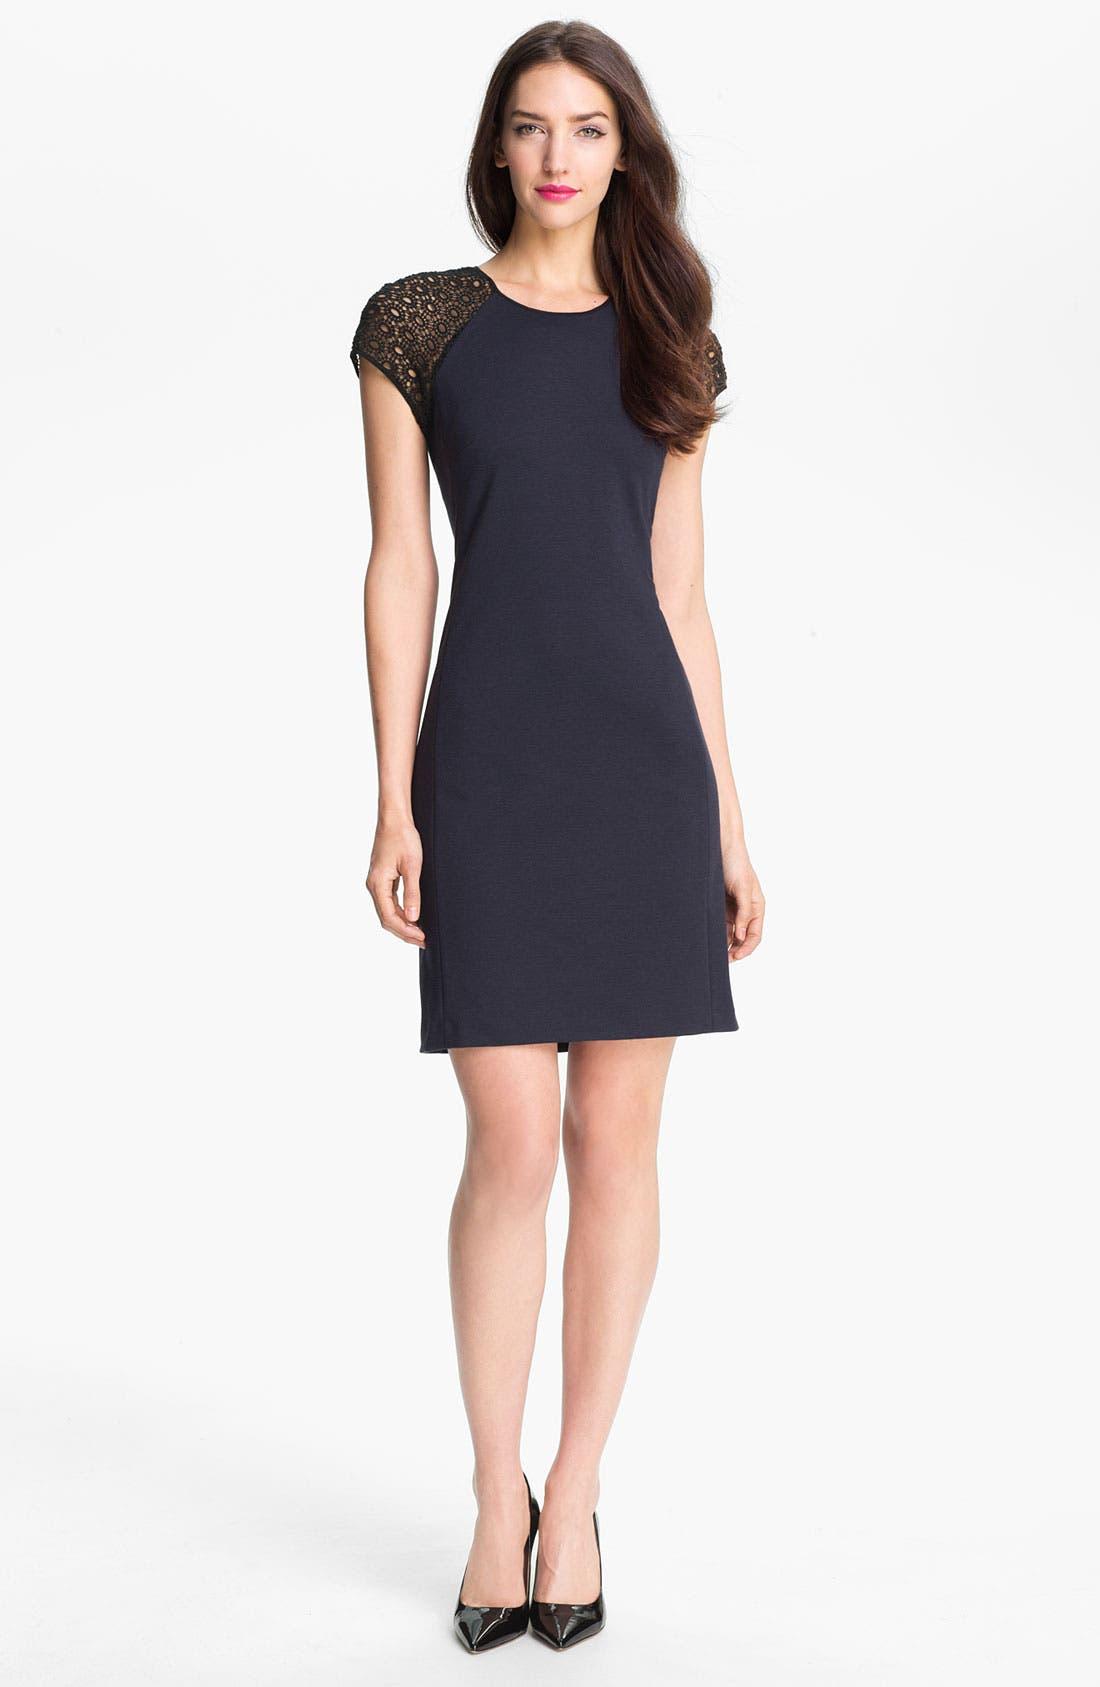 Alternate Image 1 Selected - Rebecca Taylor Ponte Knit Sheath Dress